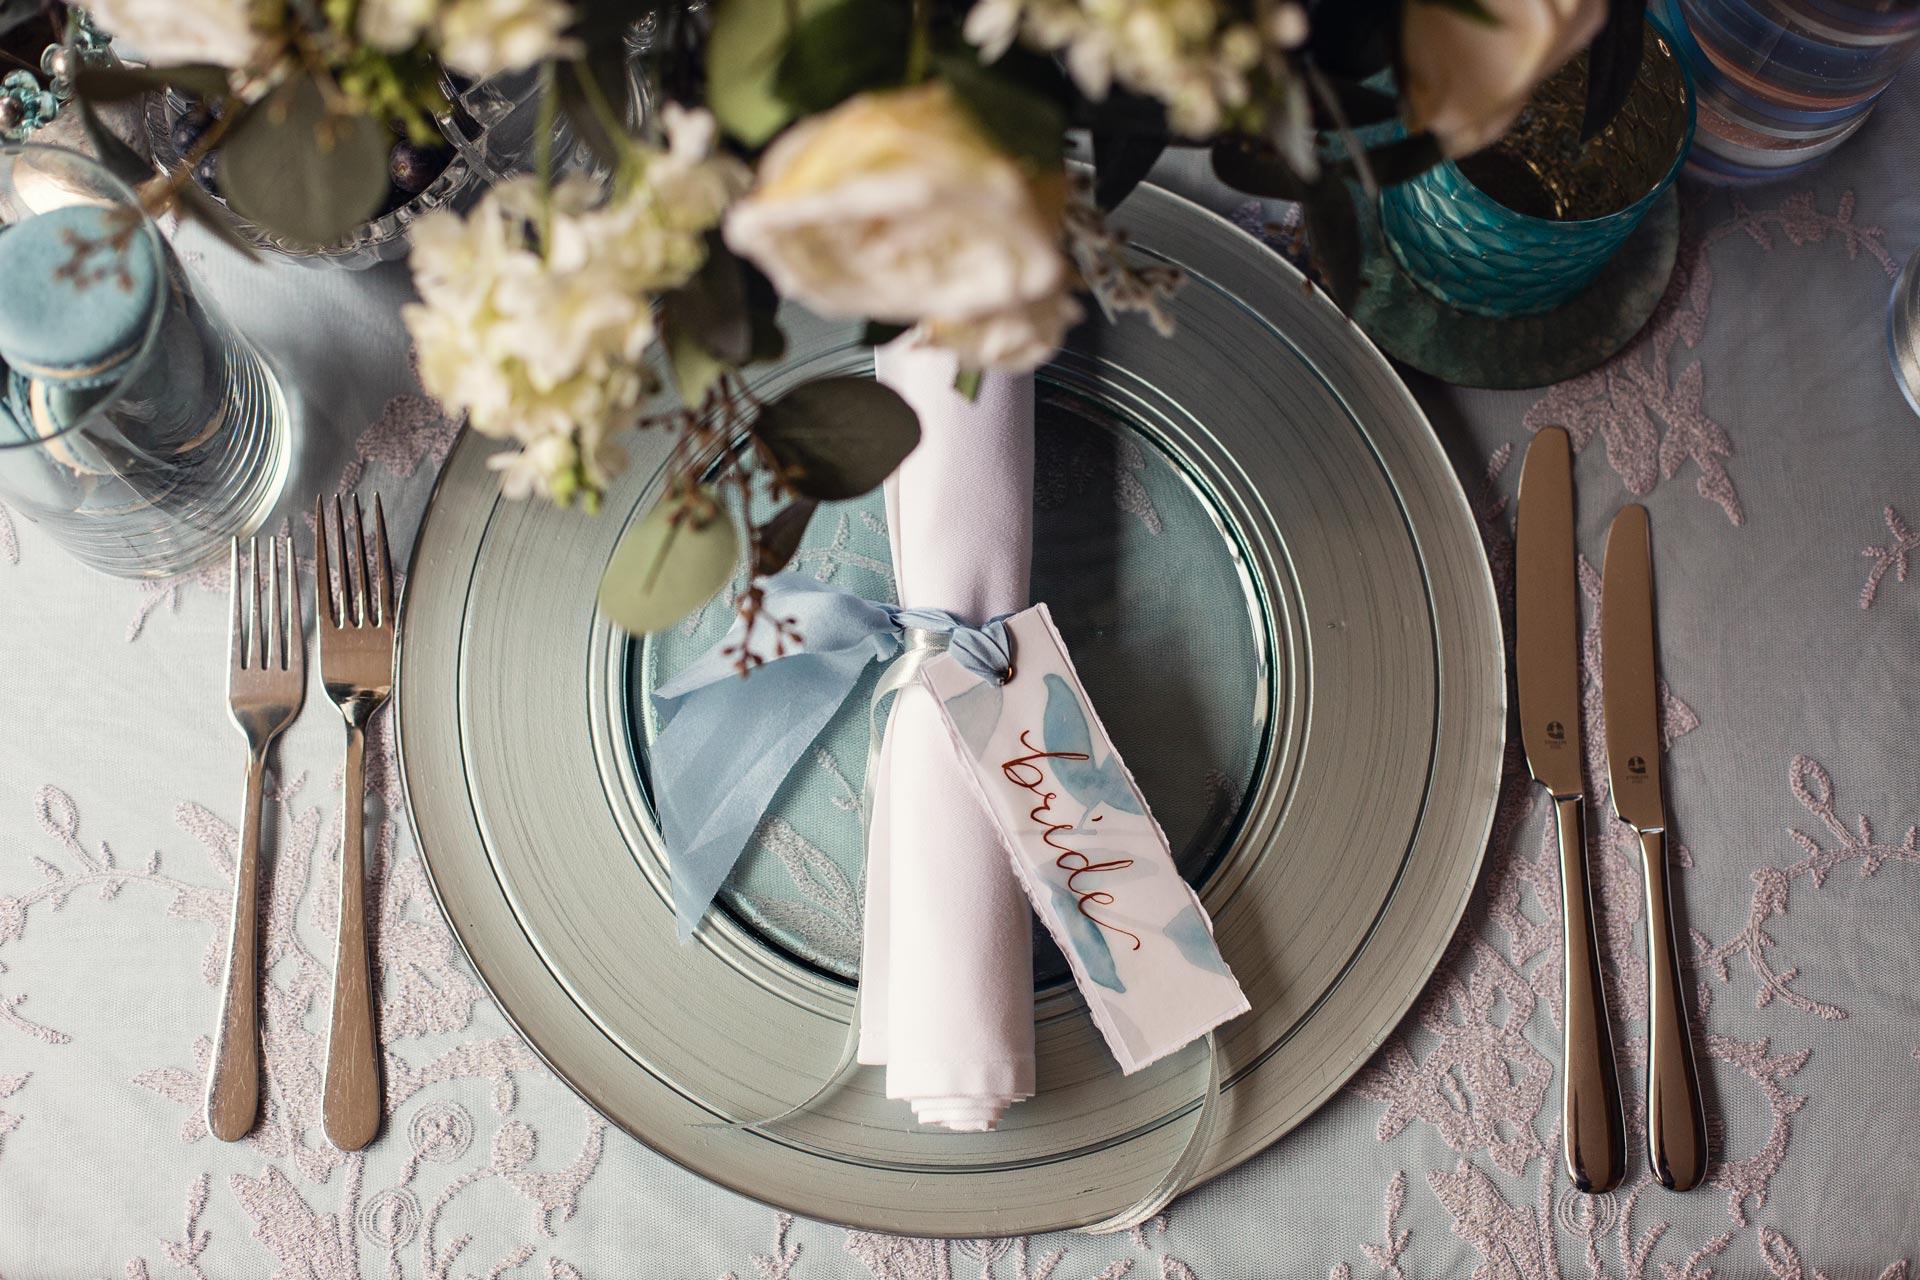 The brides Dinner assortment